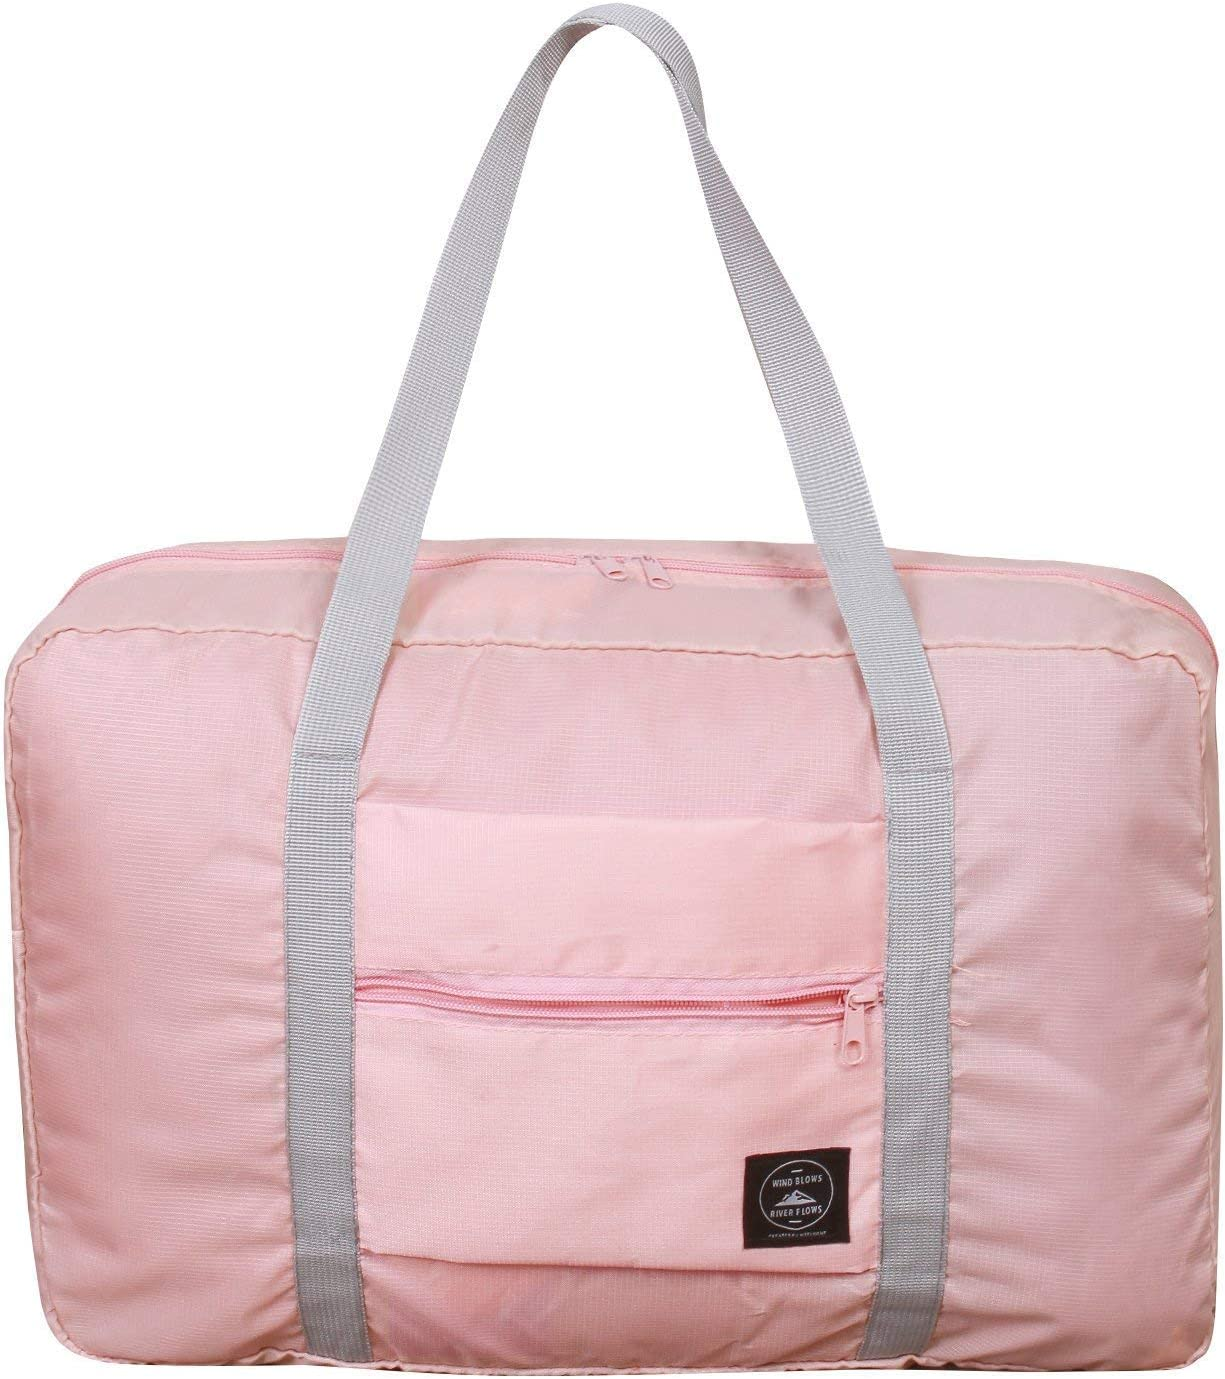 Foldable Duffel Bag for Women and Men-Pink, Heylian Lightweight Waterproof Luggage Travel Bag